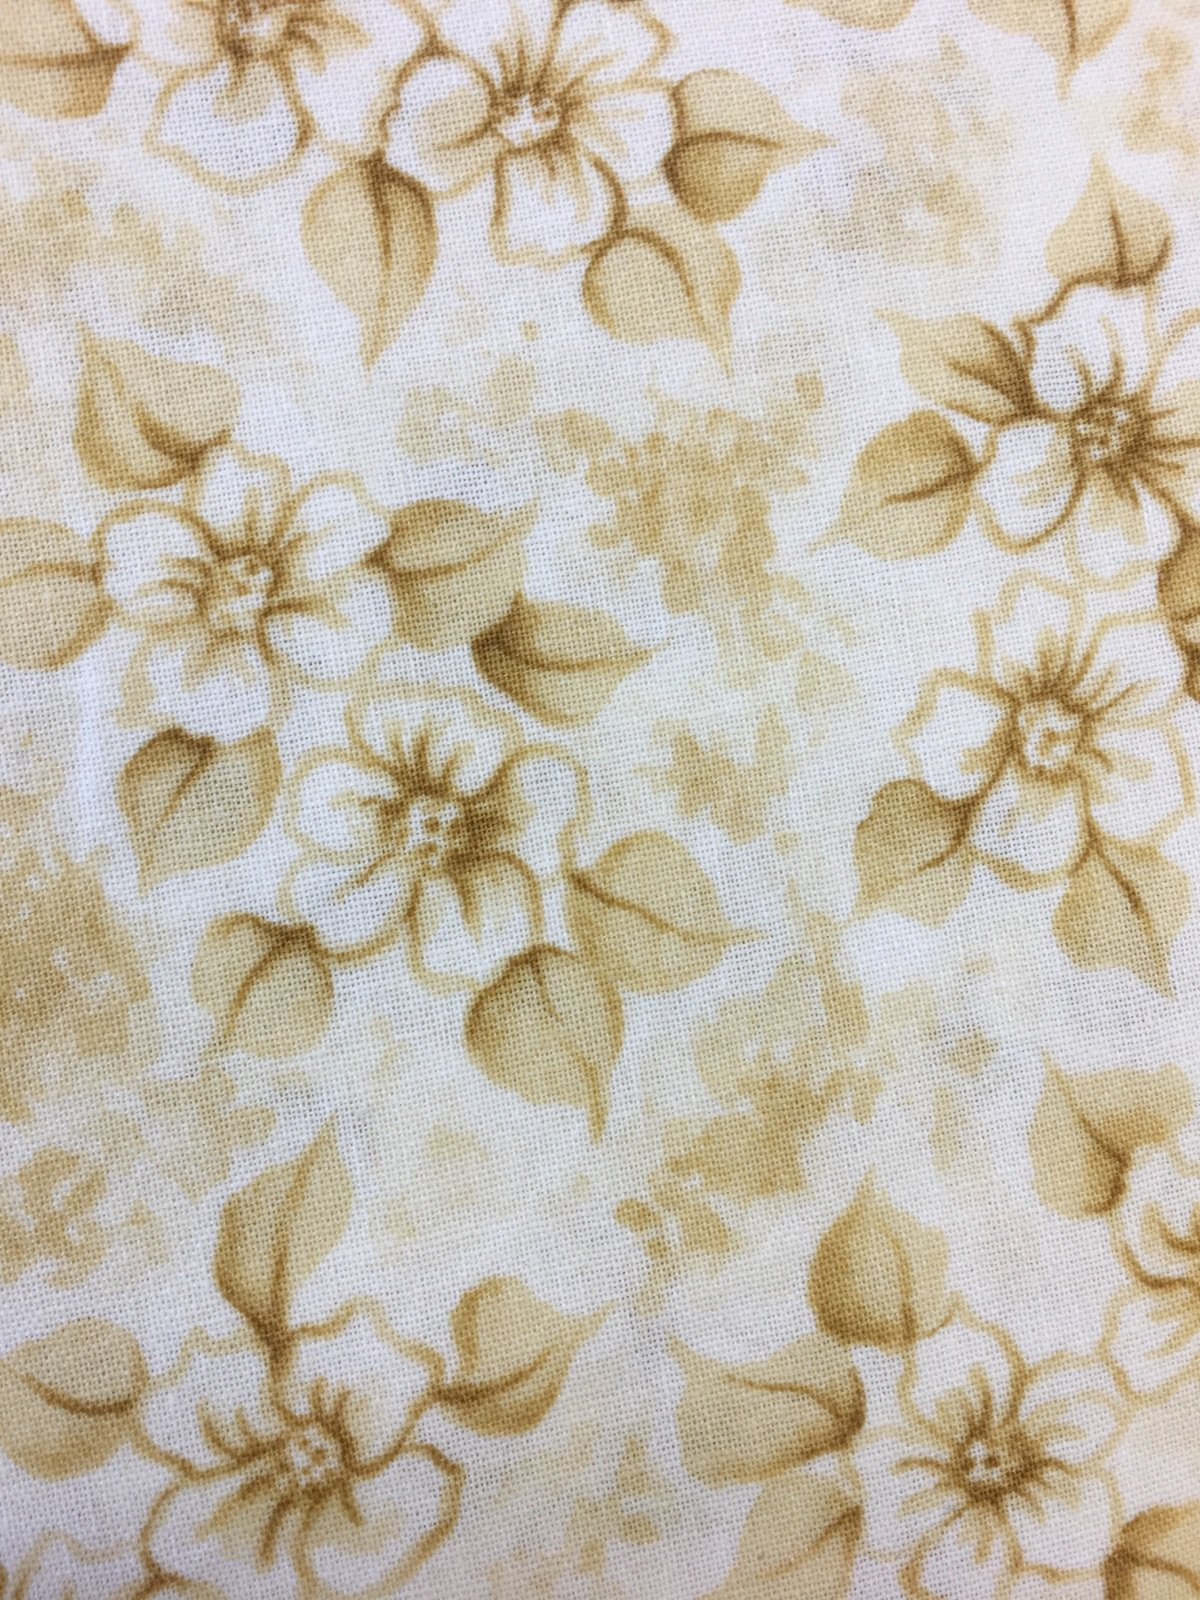 Tea Party-Cream with Yellow Flowers Y0545-11 Light Khaki